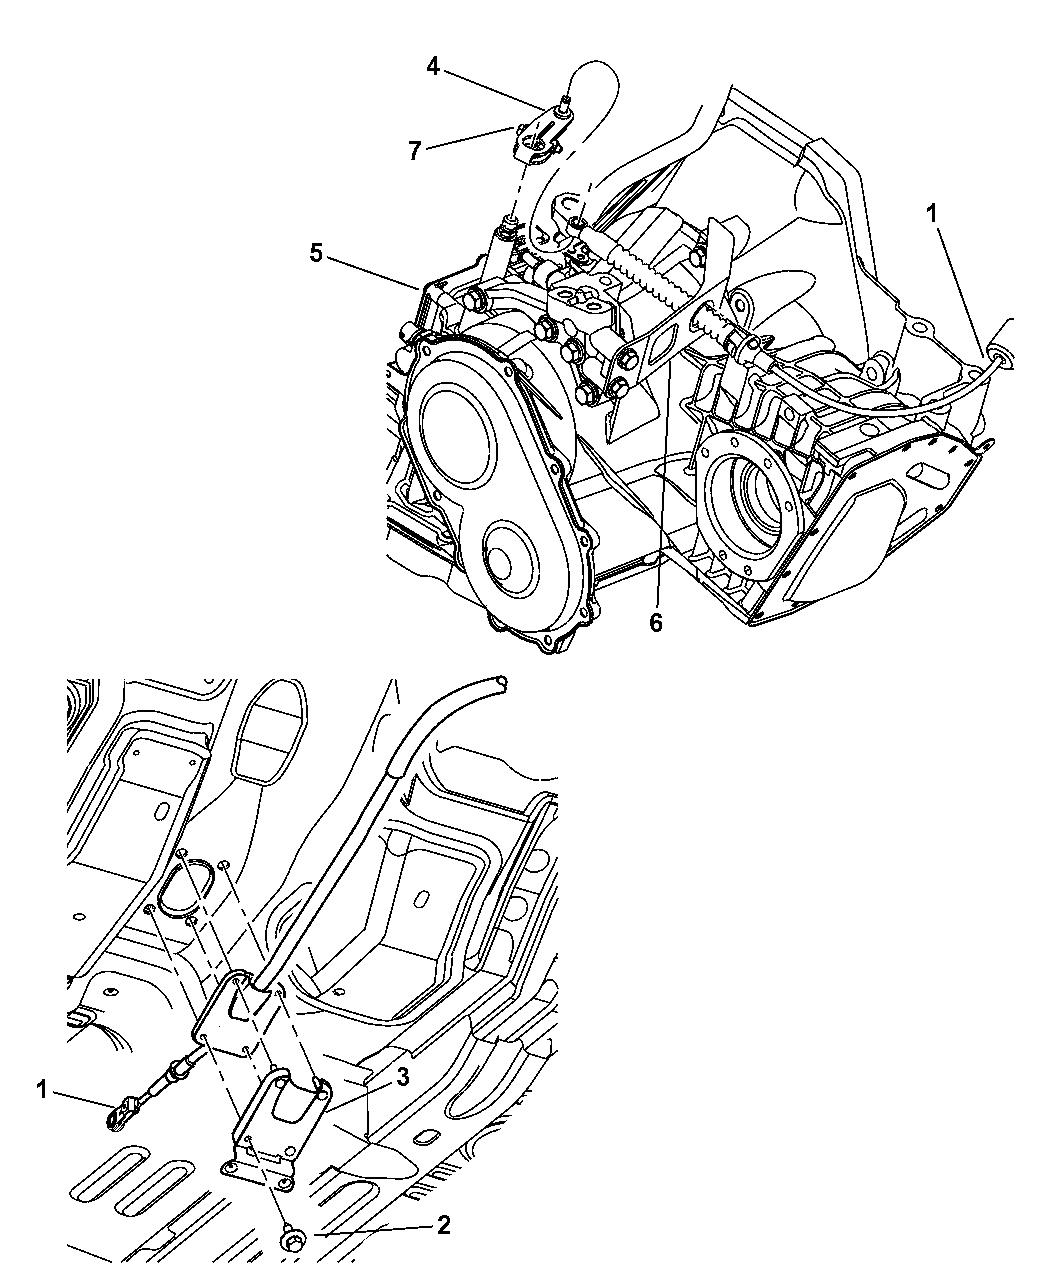 2003 Chrysler PT Cruiser Shifter Cable & Lever